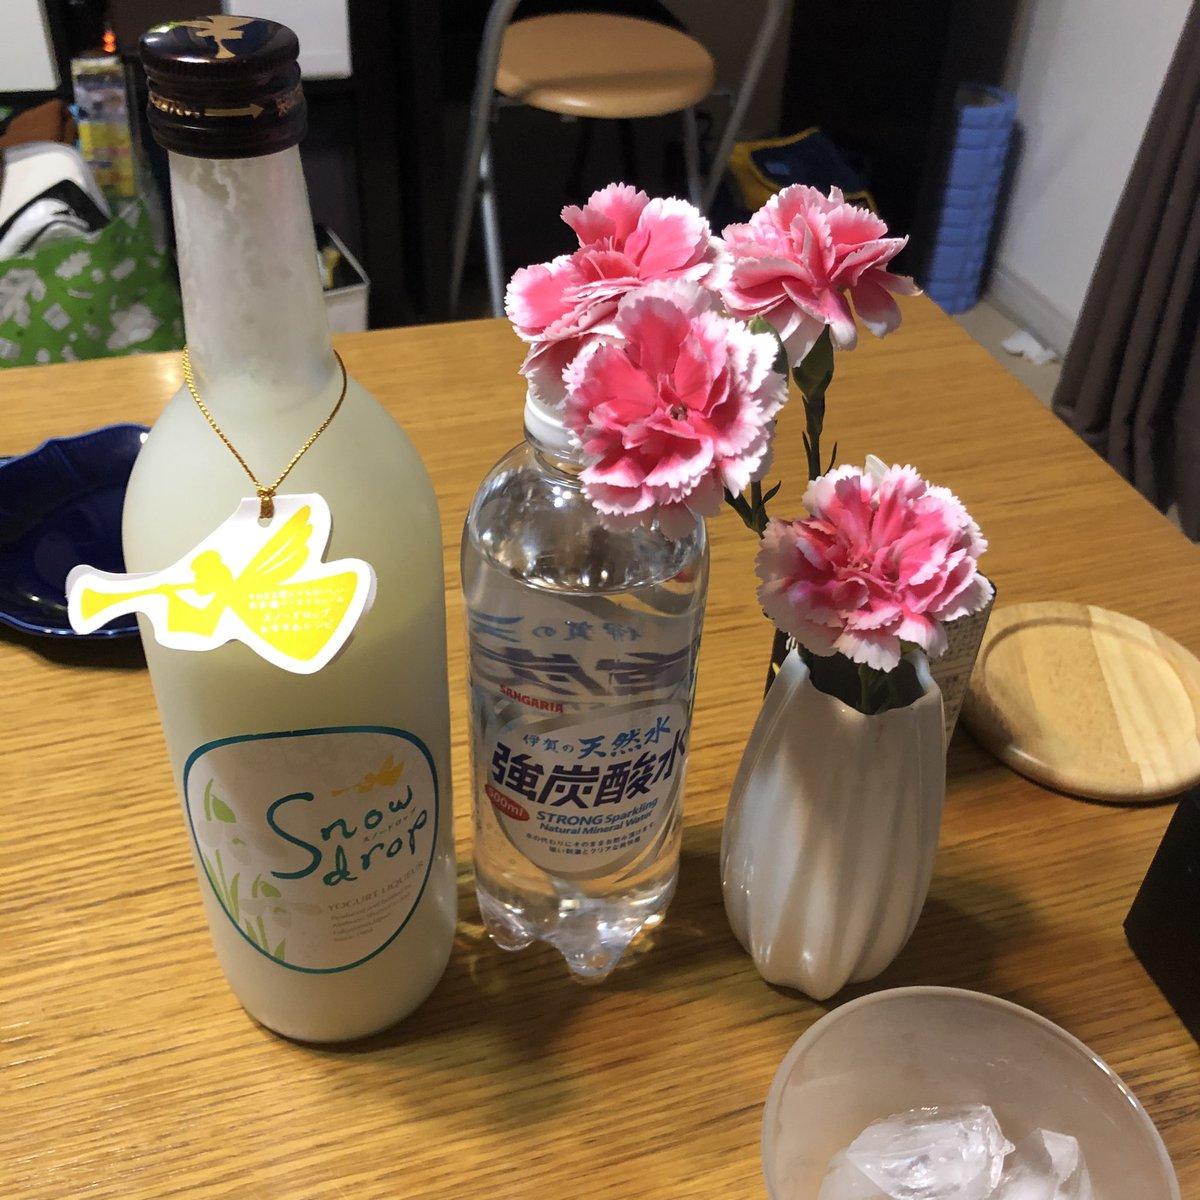 test ツイッターメディア - 曙酒造「SnowDrop-スノードロップ ヨーグルト」 瑞穂黄金という酒米と会津中央乳業の飲むヨーグルト、曙酒造の日本酒でつくられたリキュール🍶 https://t.co/t5xBXu53l6